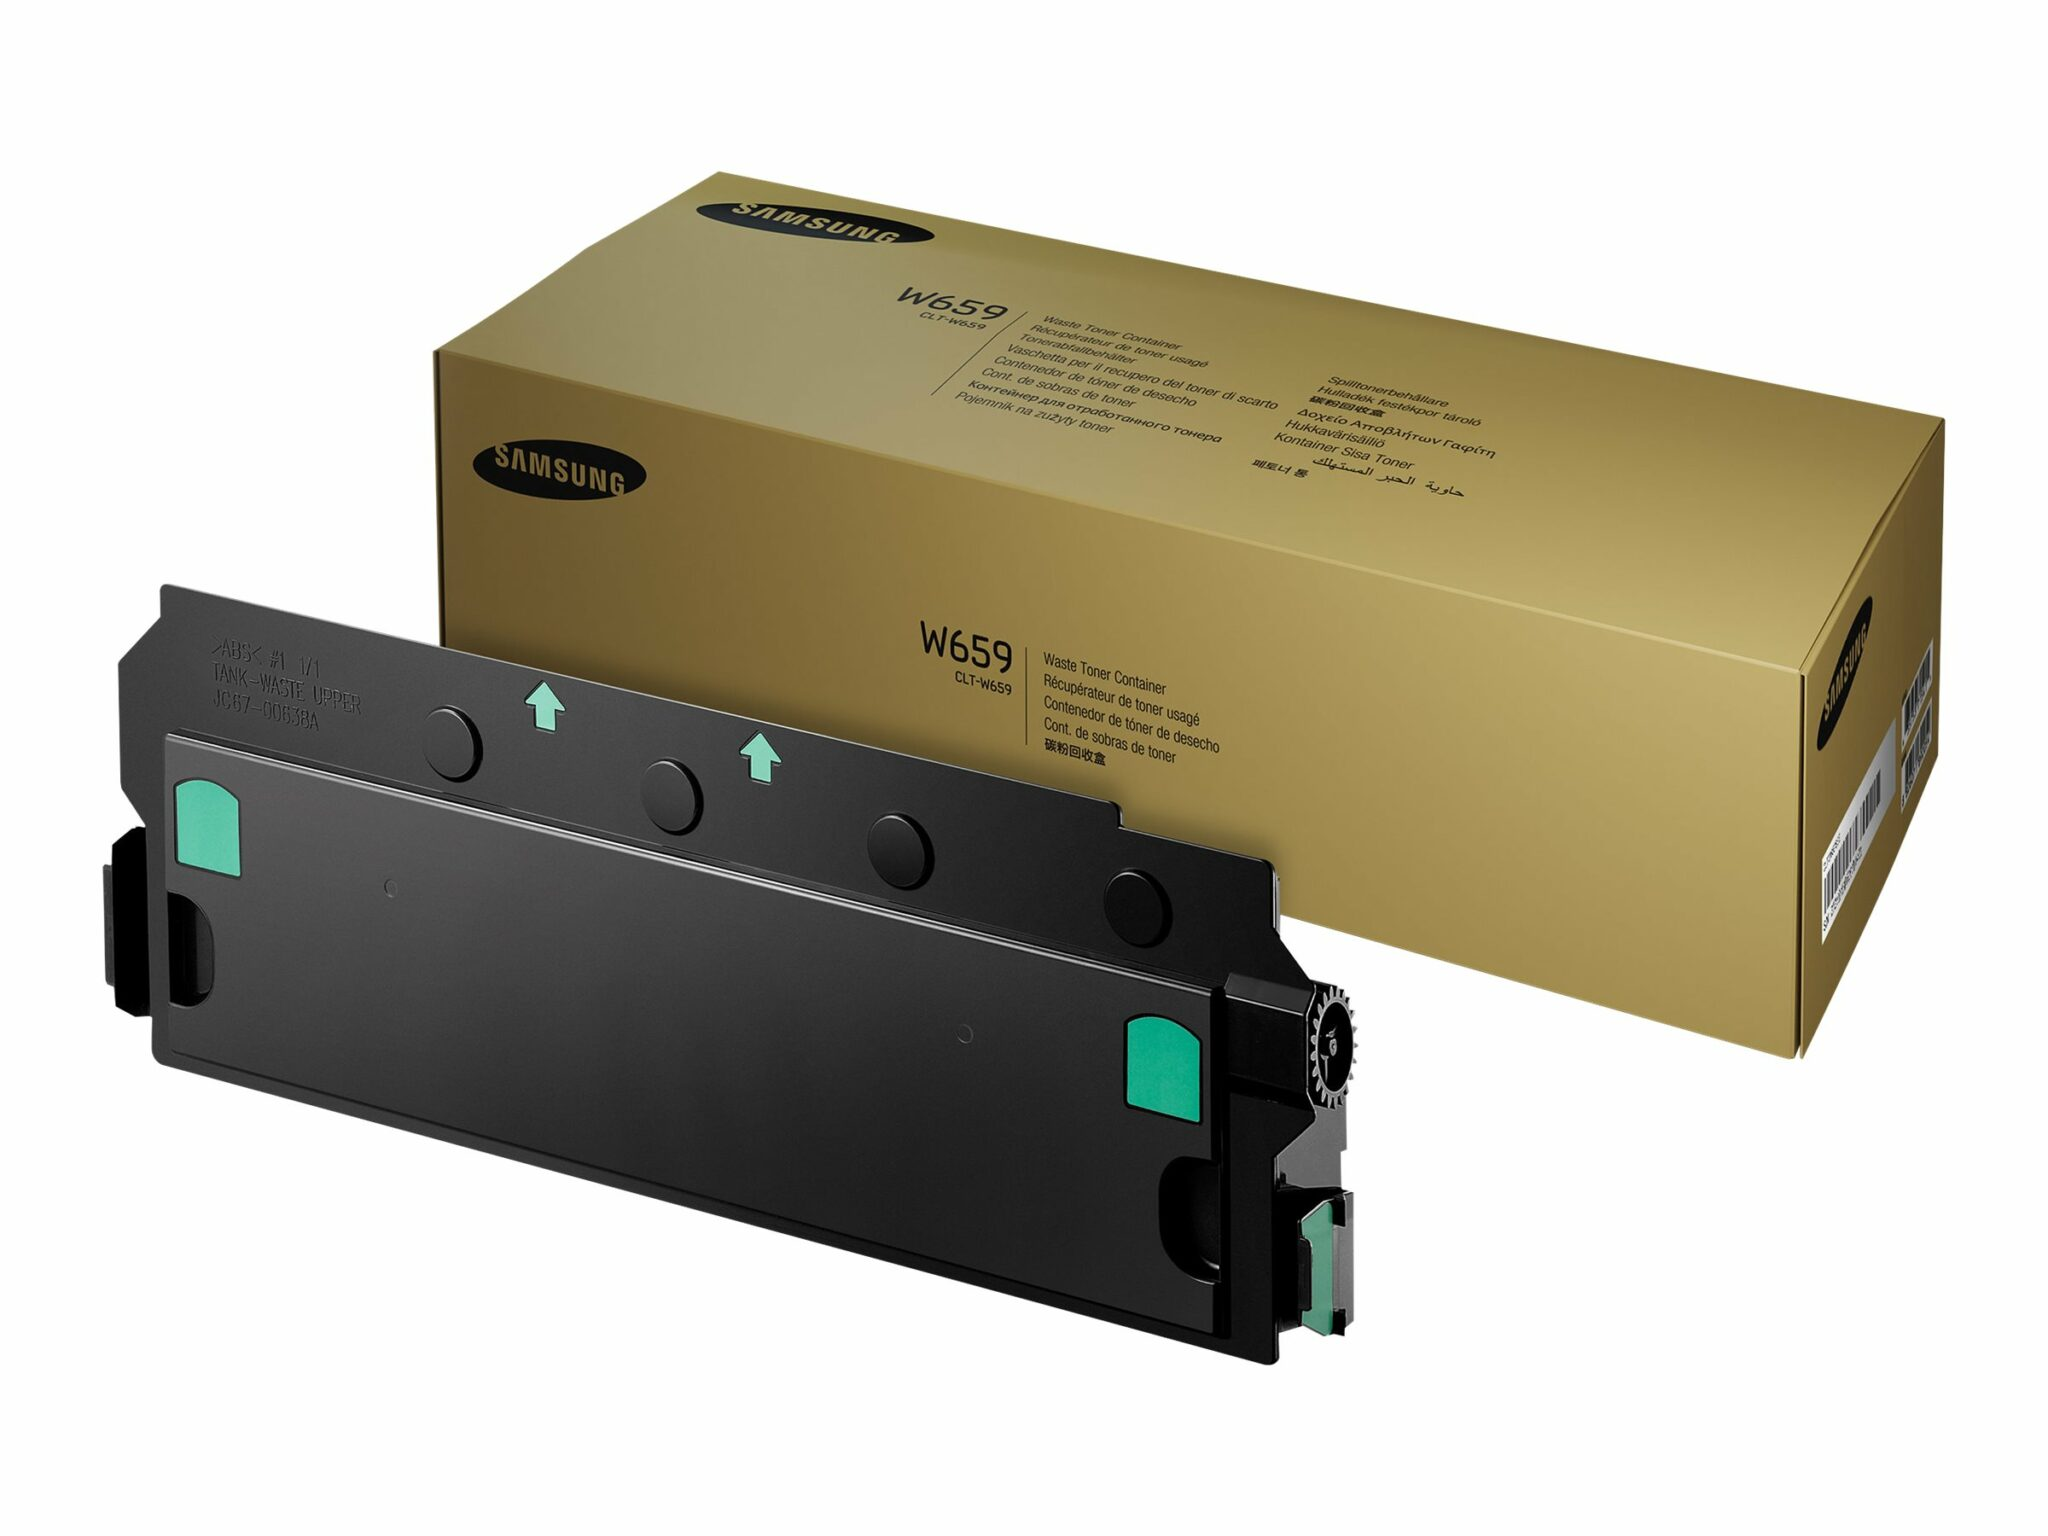 HP Samsung CLT-W659 Toner Collection Unit